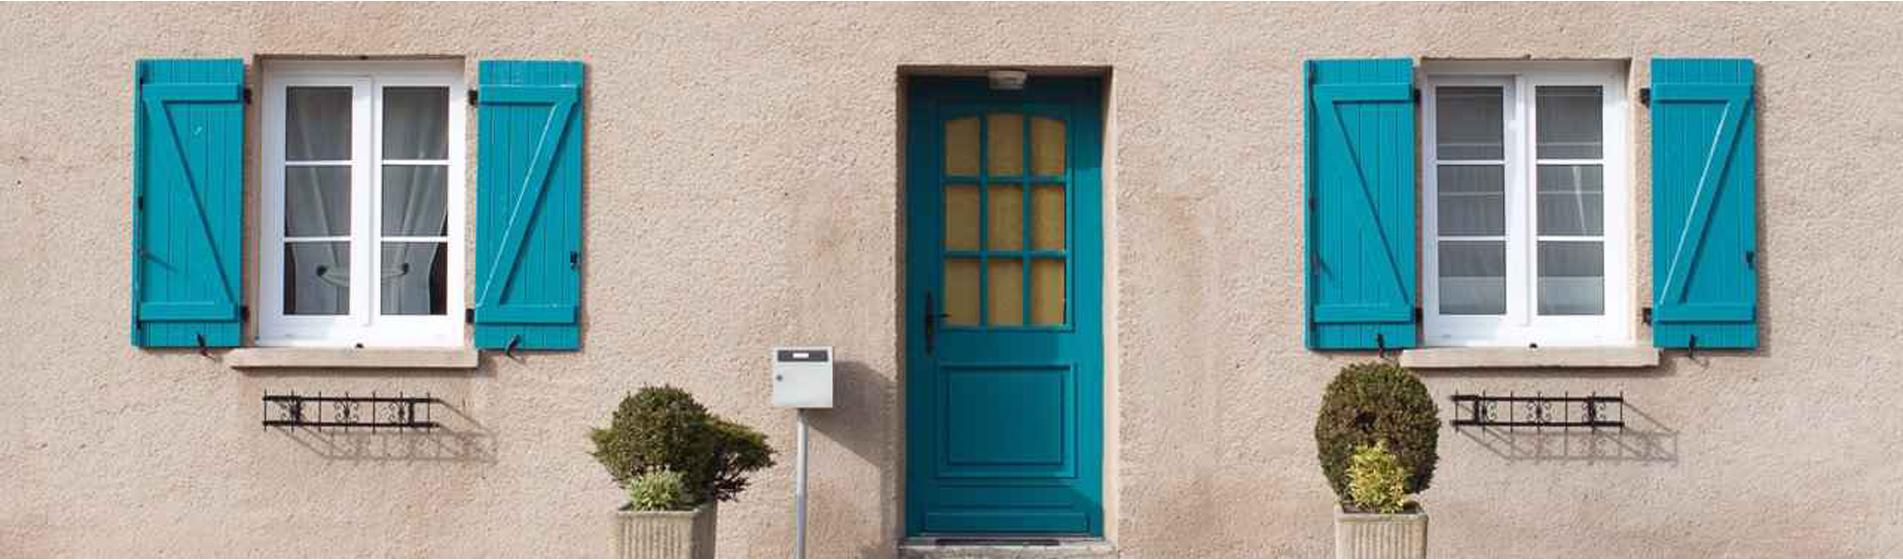 rénovation porte fenêtre alu 13 Bouches-du-Rhône